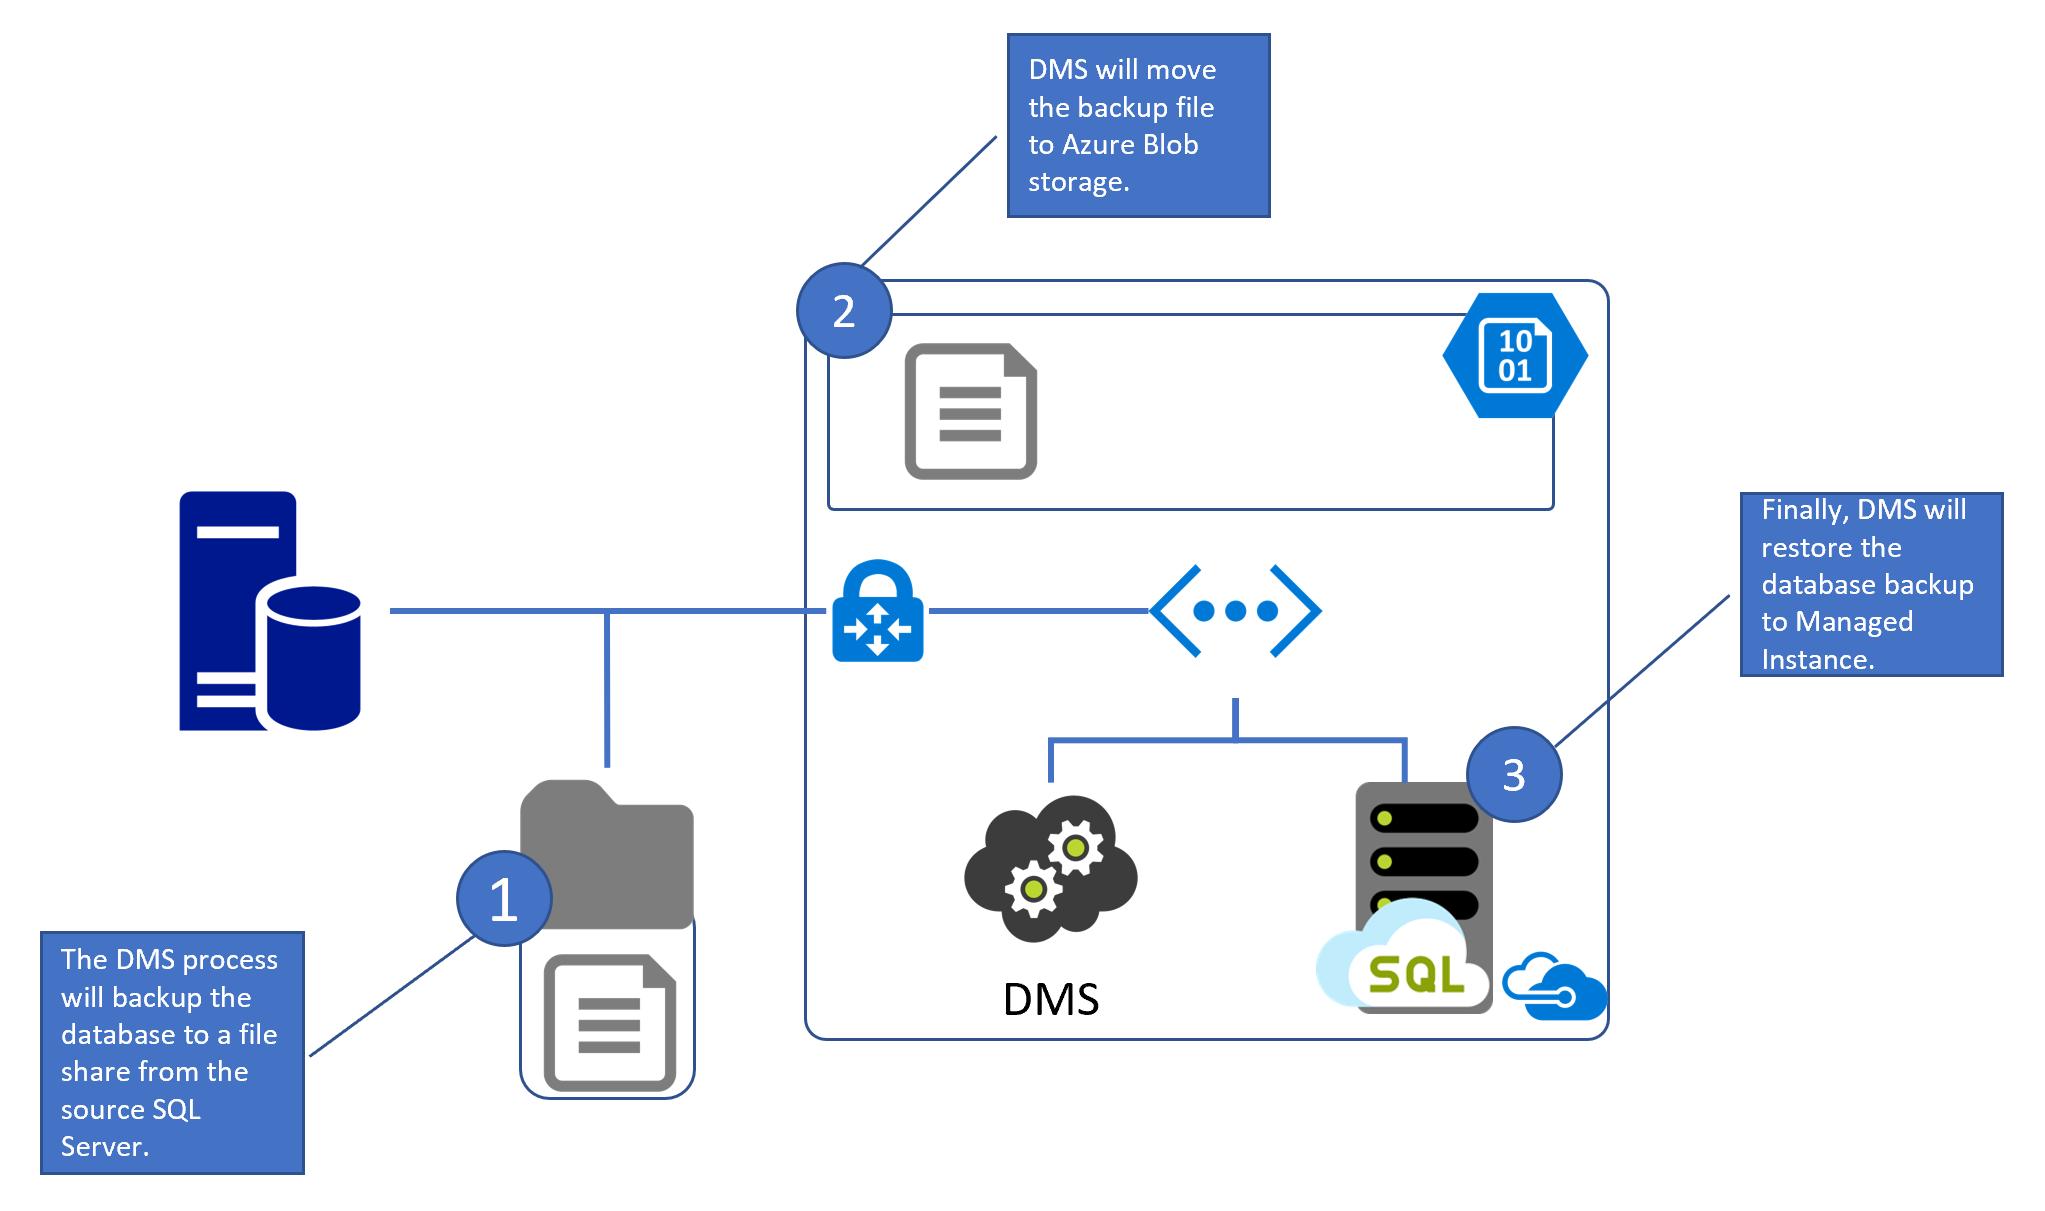 sql server 2008 database architecture diagram cloud migration guide sql server to azure  2020   cloud migration guide sql server to